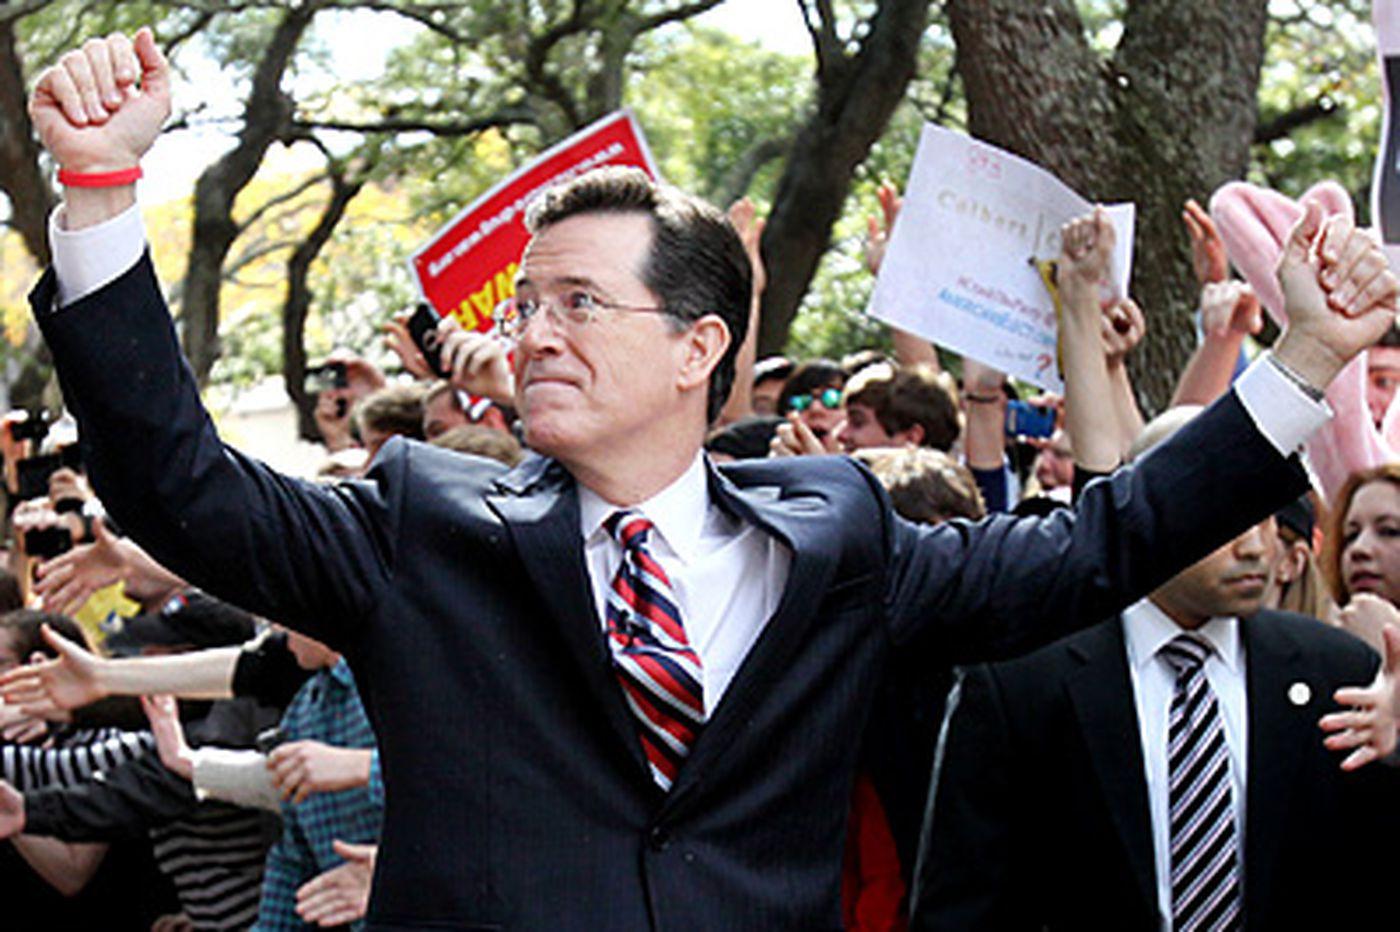 The American Debate: Our leaders, not Colbert, made the mockery